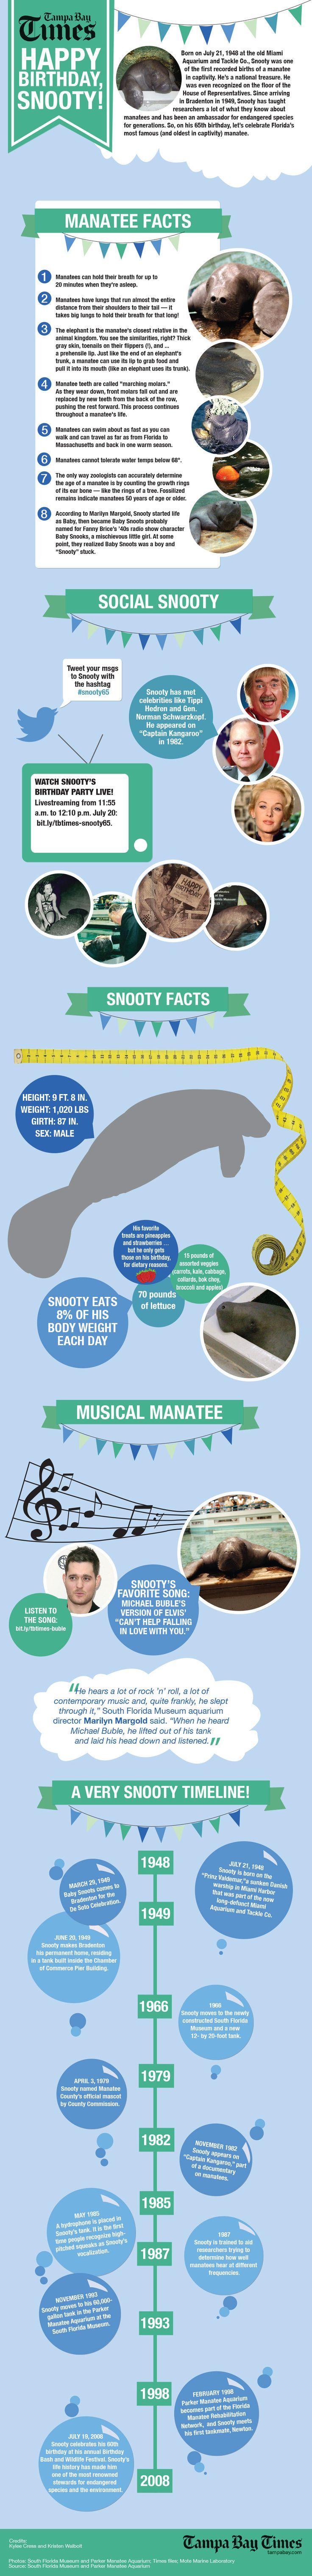 Snooty The Manatee Turns 65 Manatee Manatee Facts Animal Facts